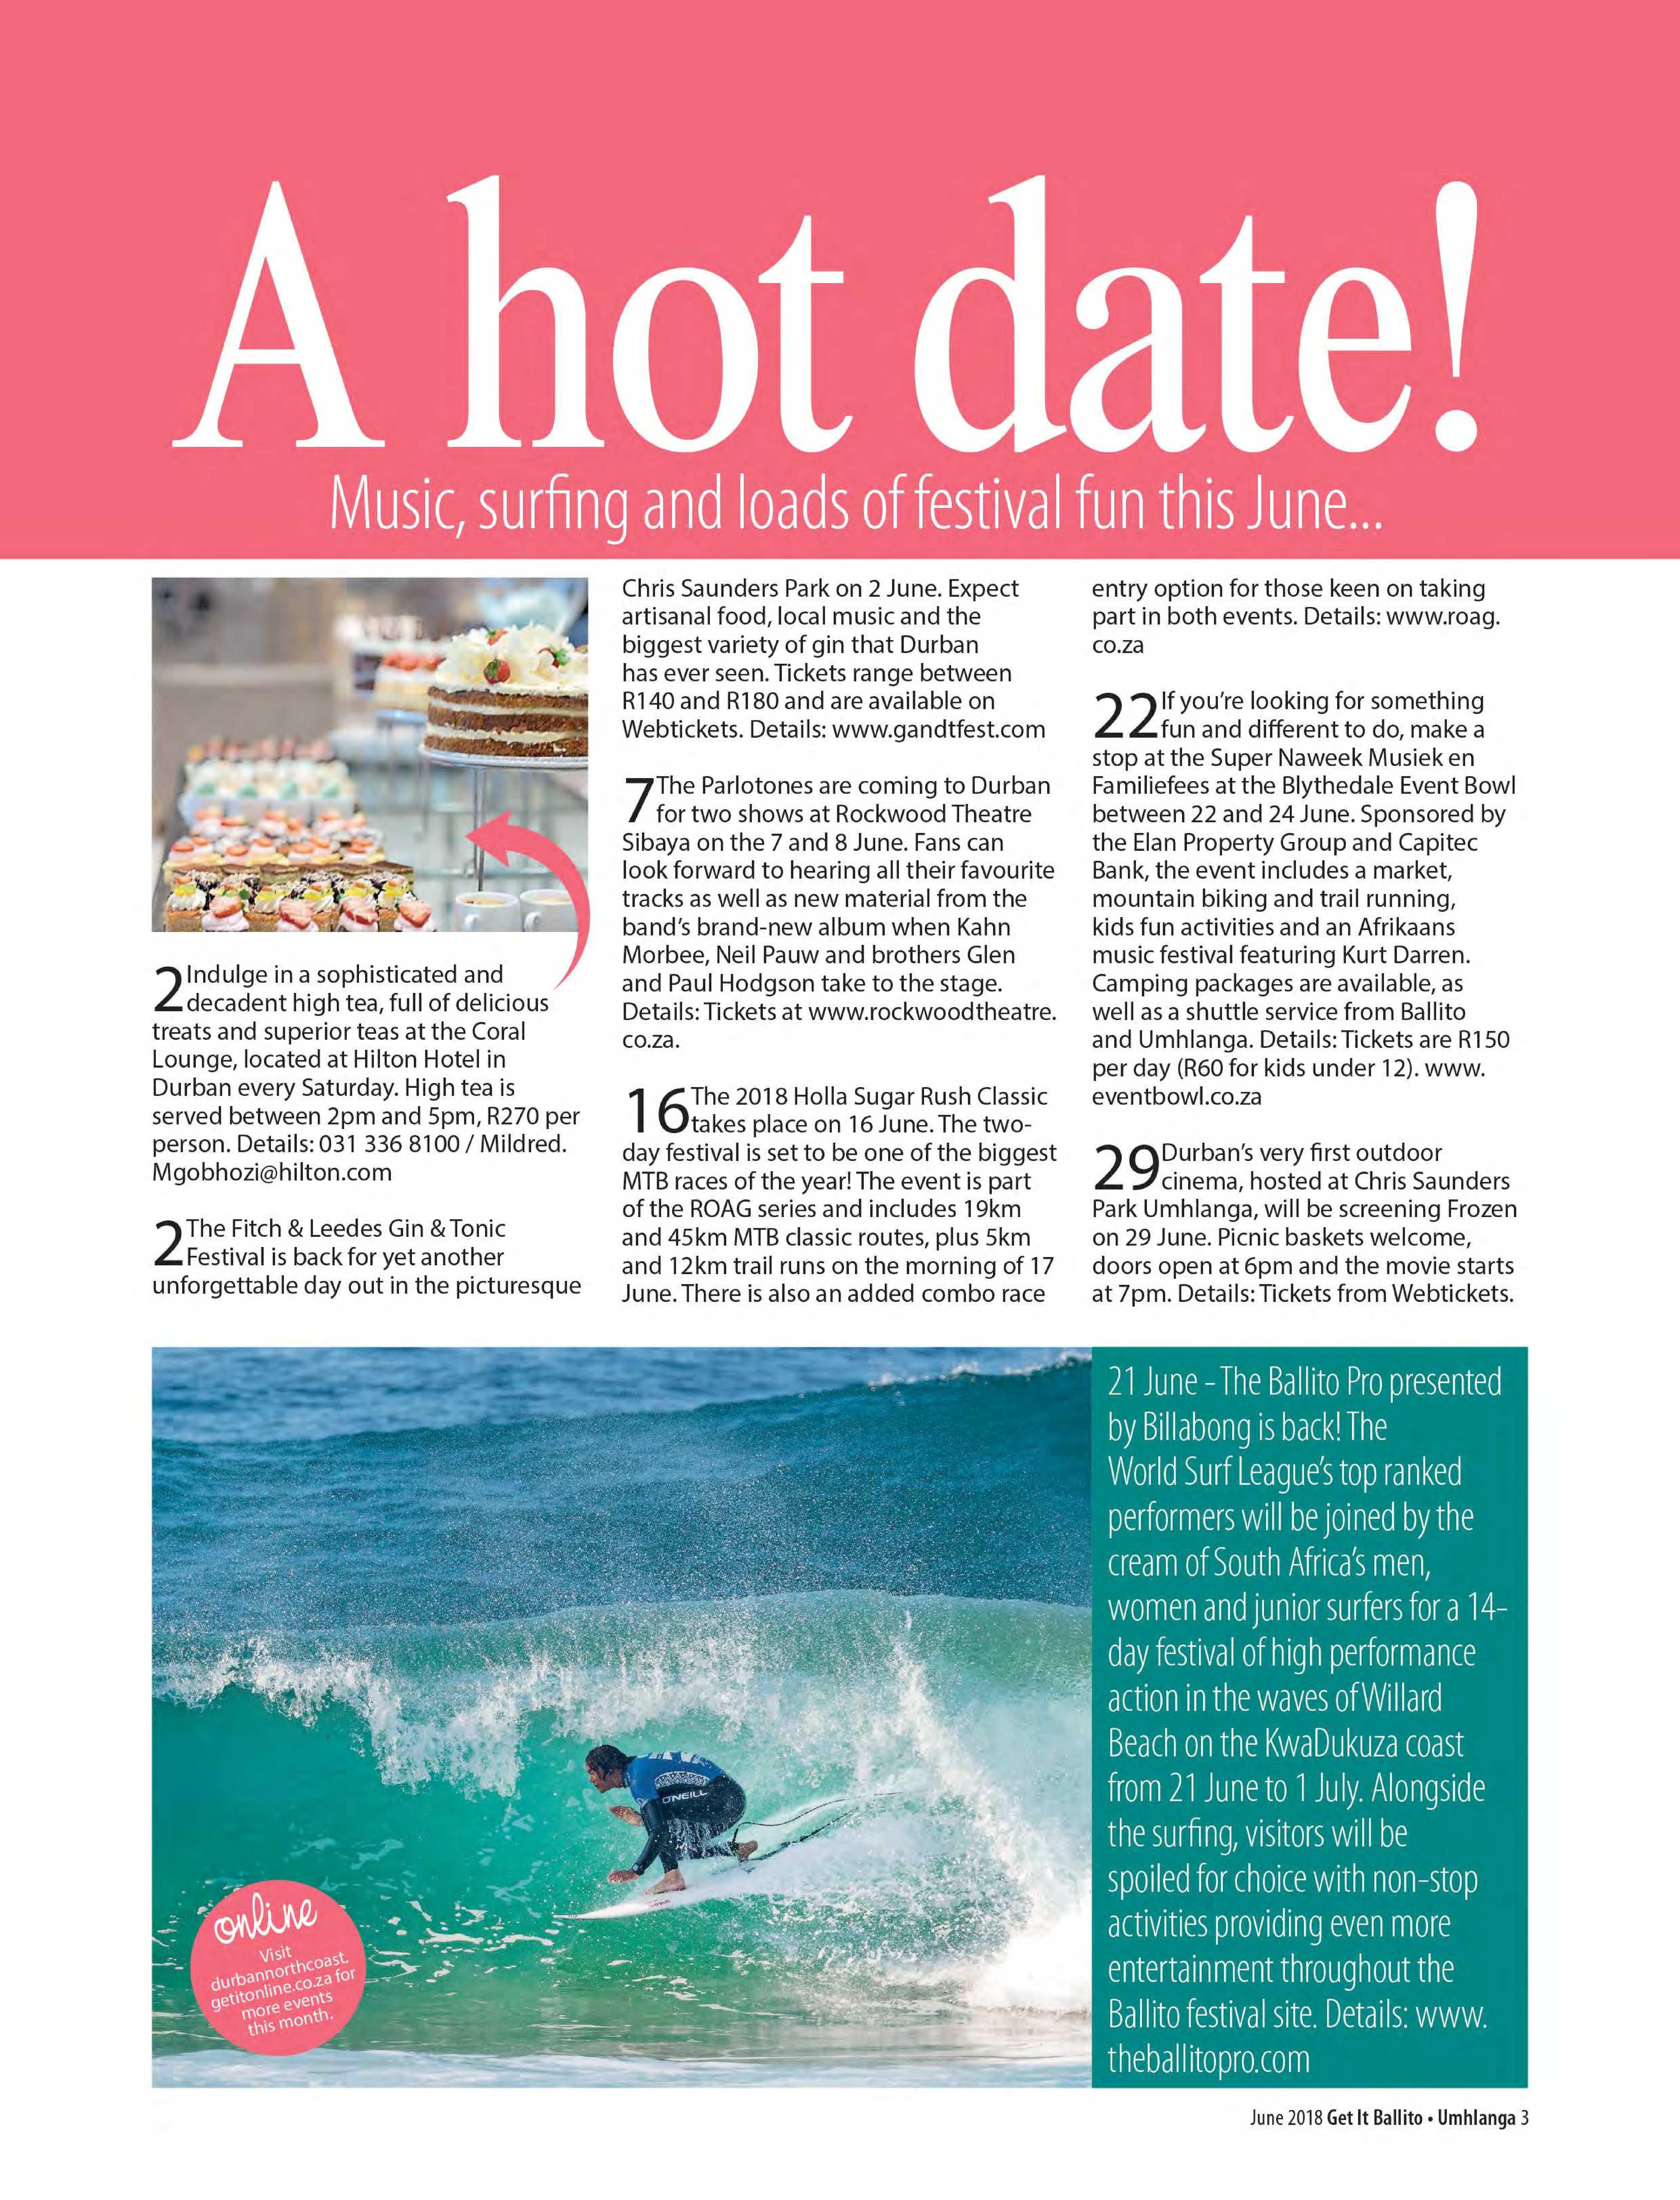 get-magazine-ballitoumhlanga-june-2018-epapers-page-5